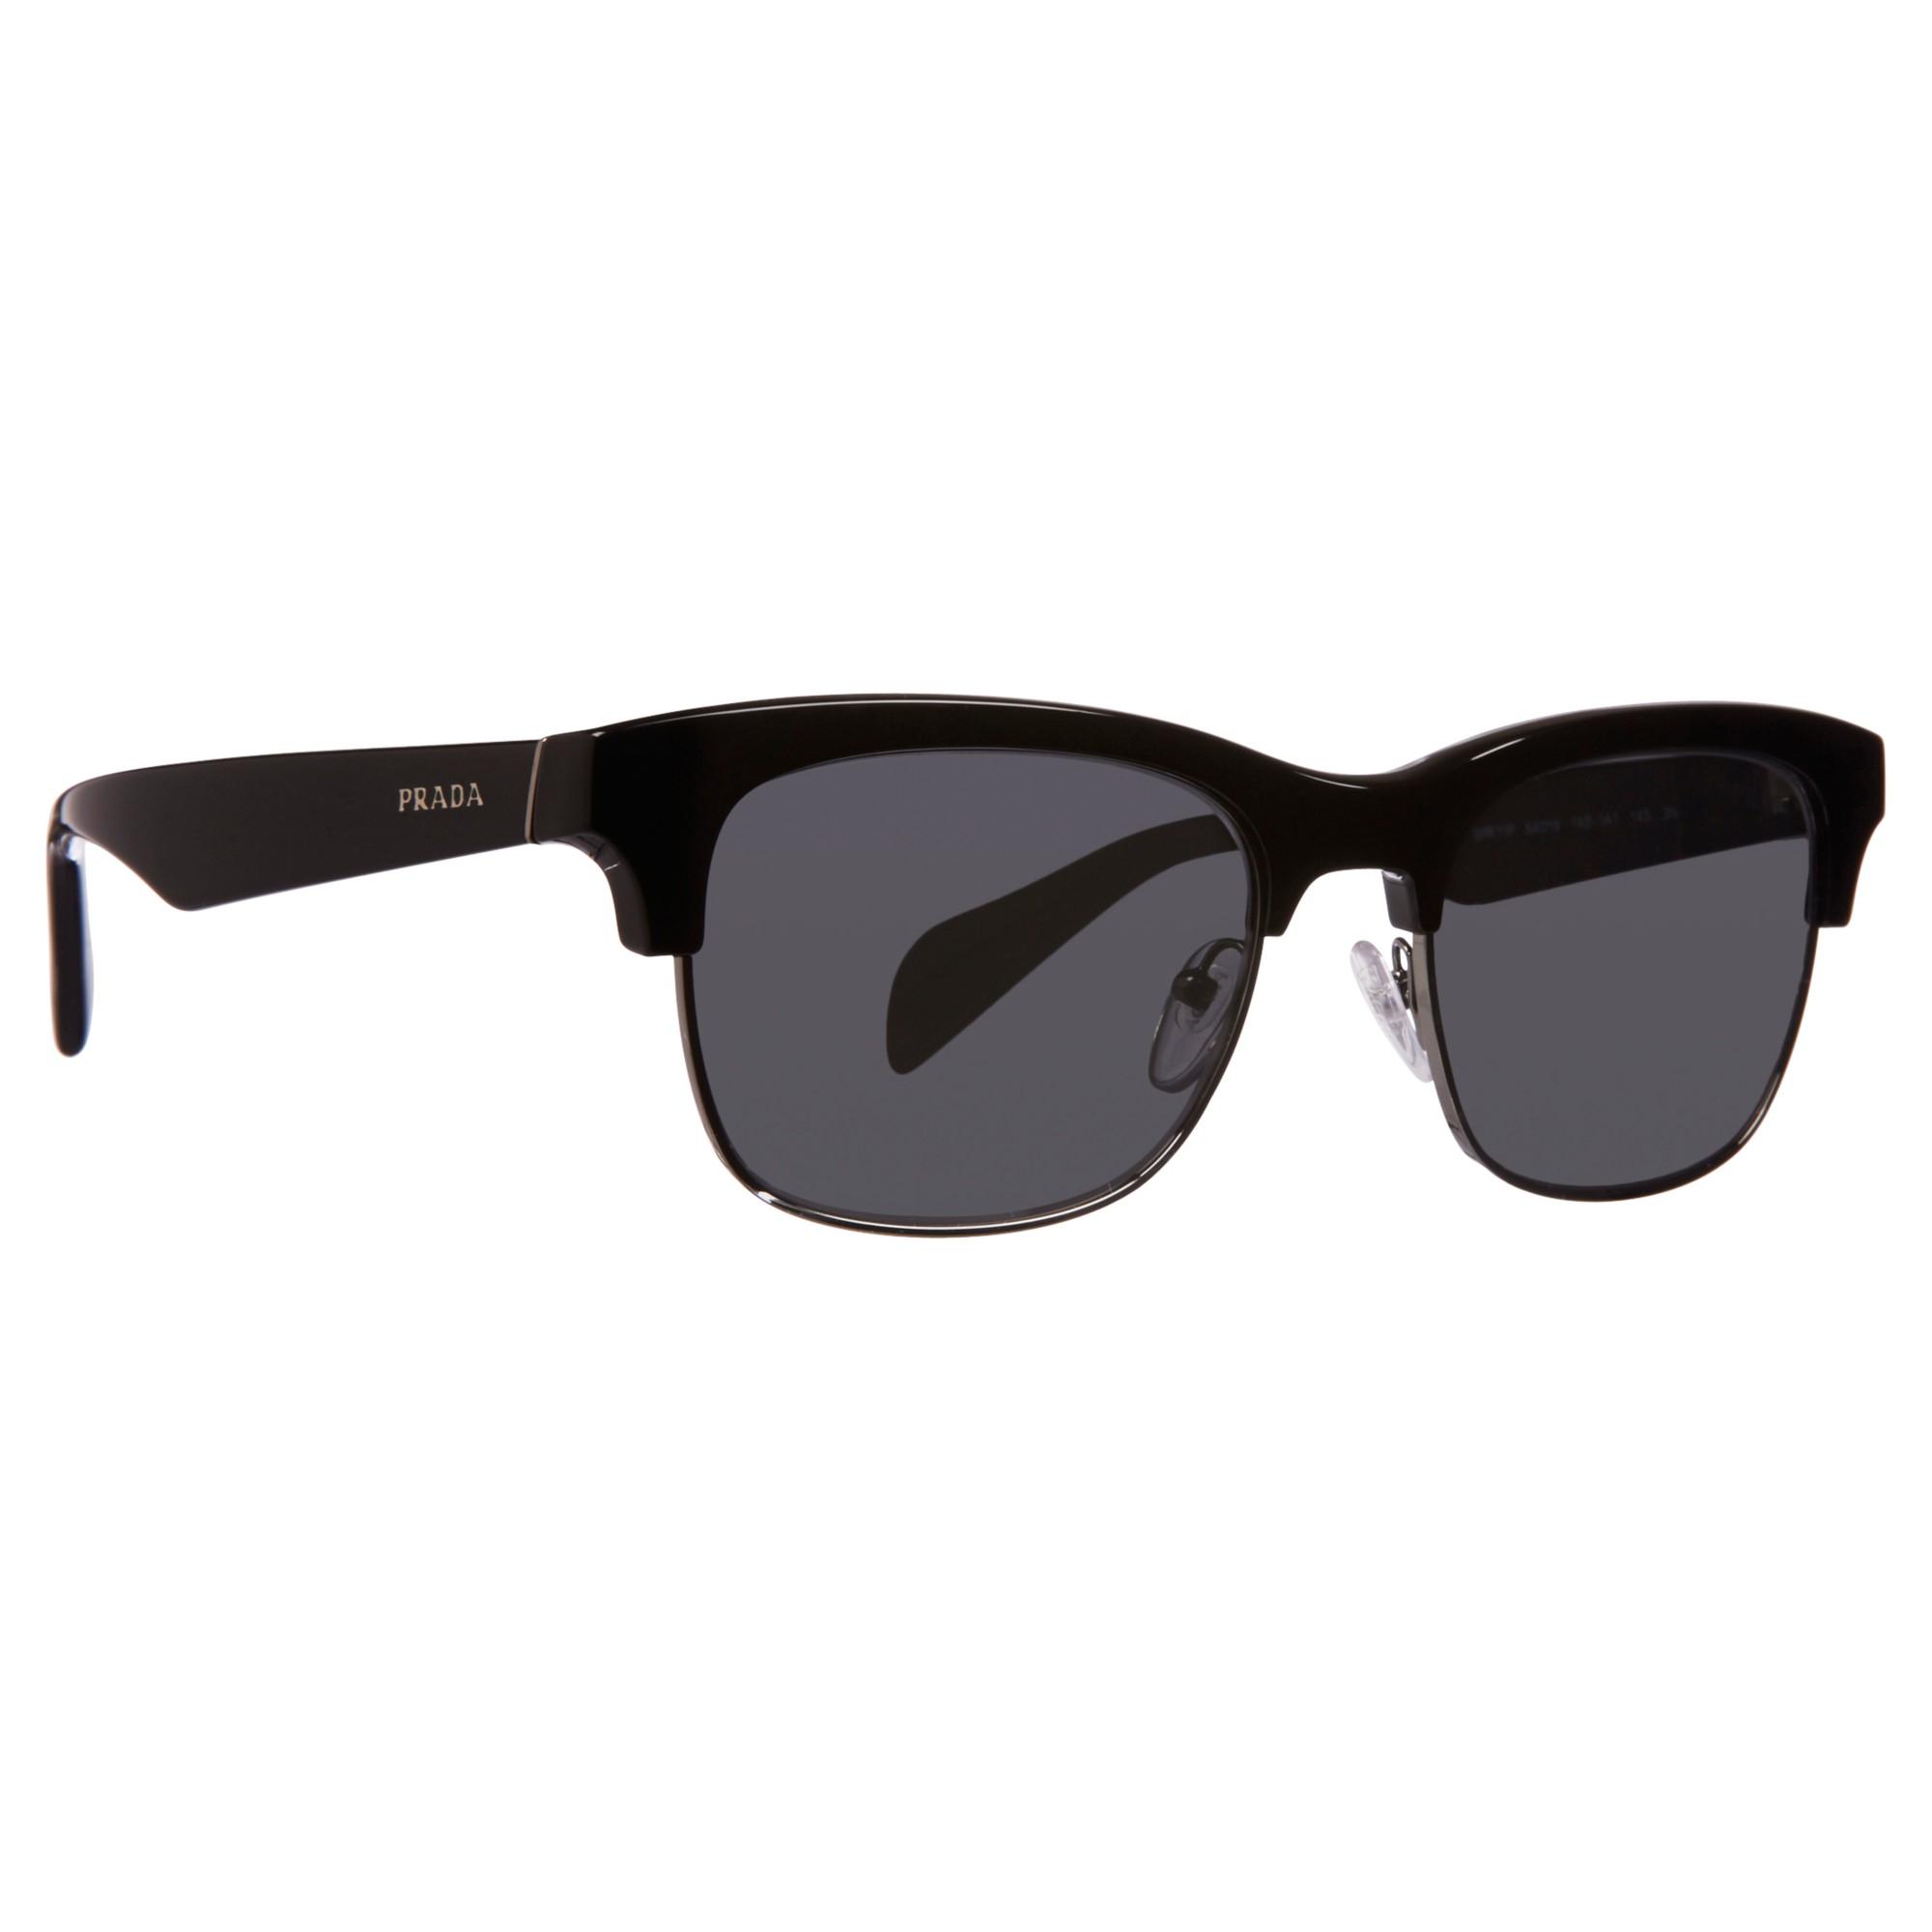 Prada Pr11ps Sunglasses in Black